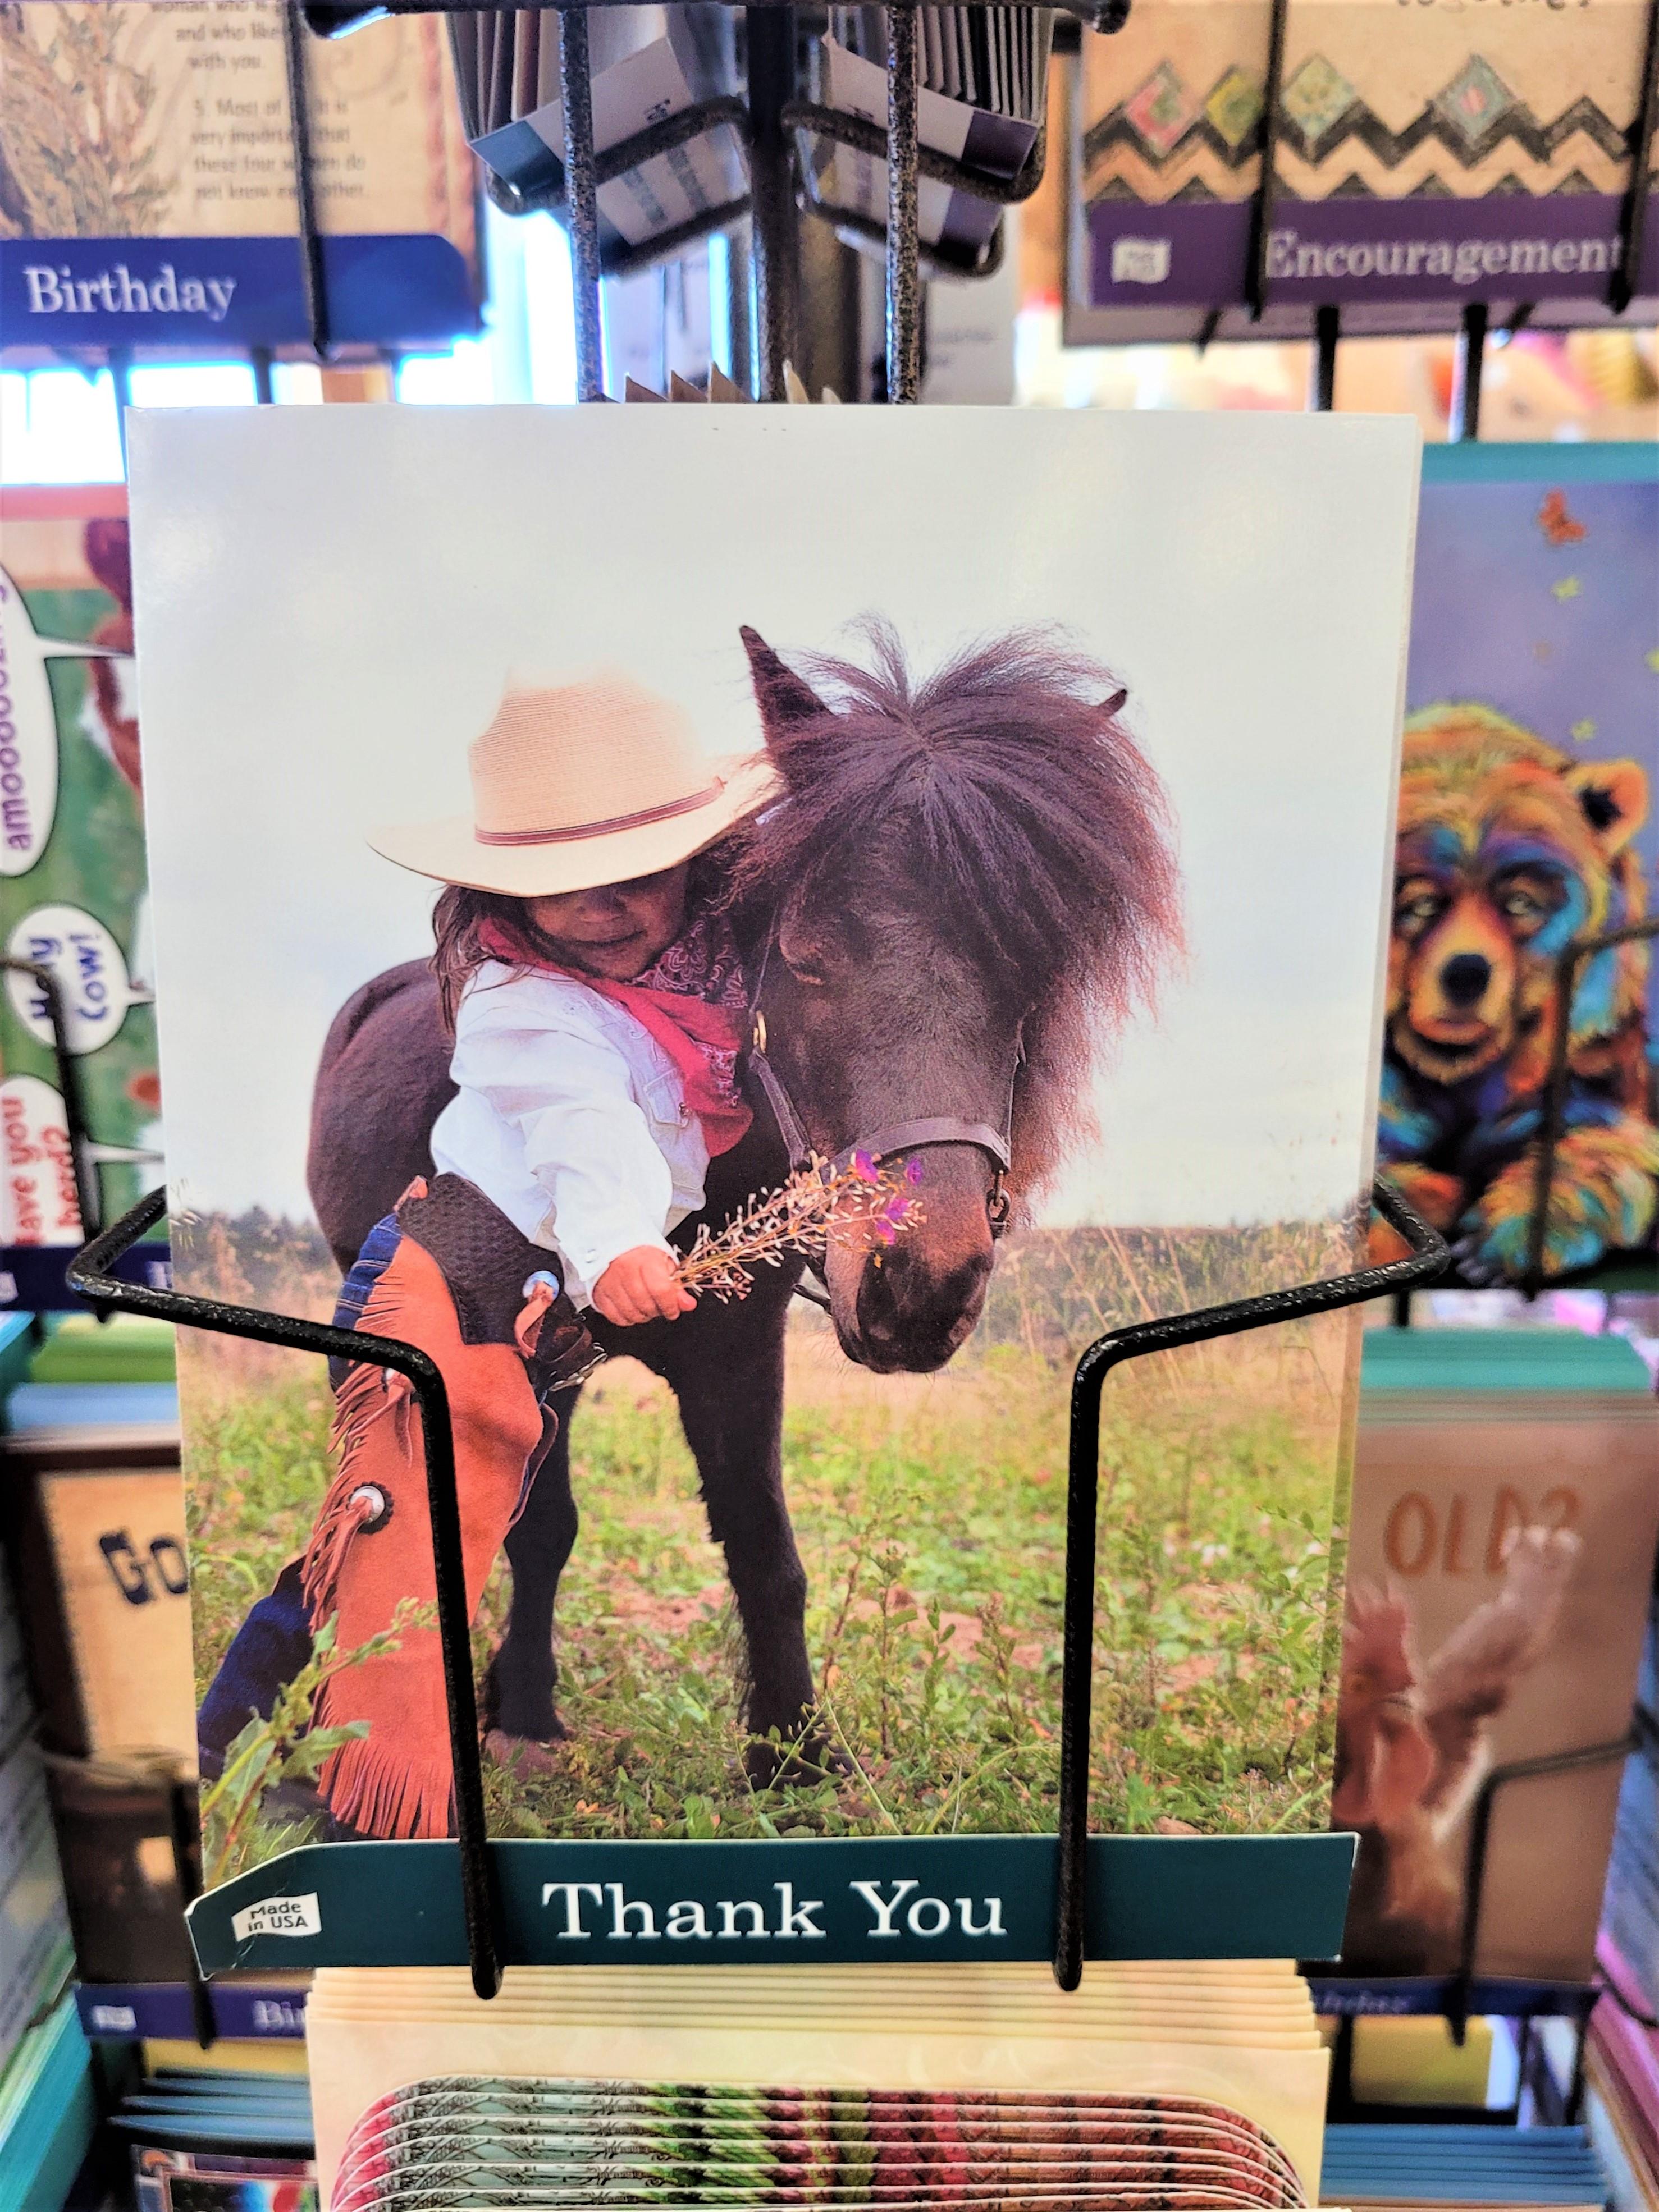 july-2021leaning-tree-greeting-cards-thank-you-child-feeding-pony-.jpg